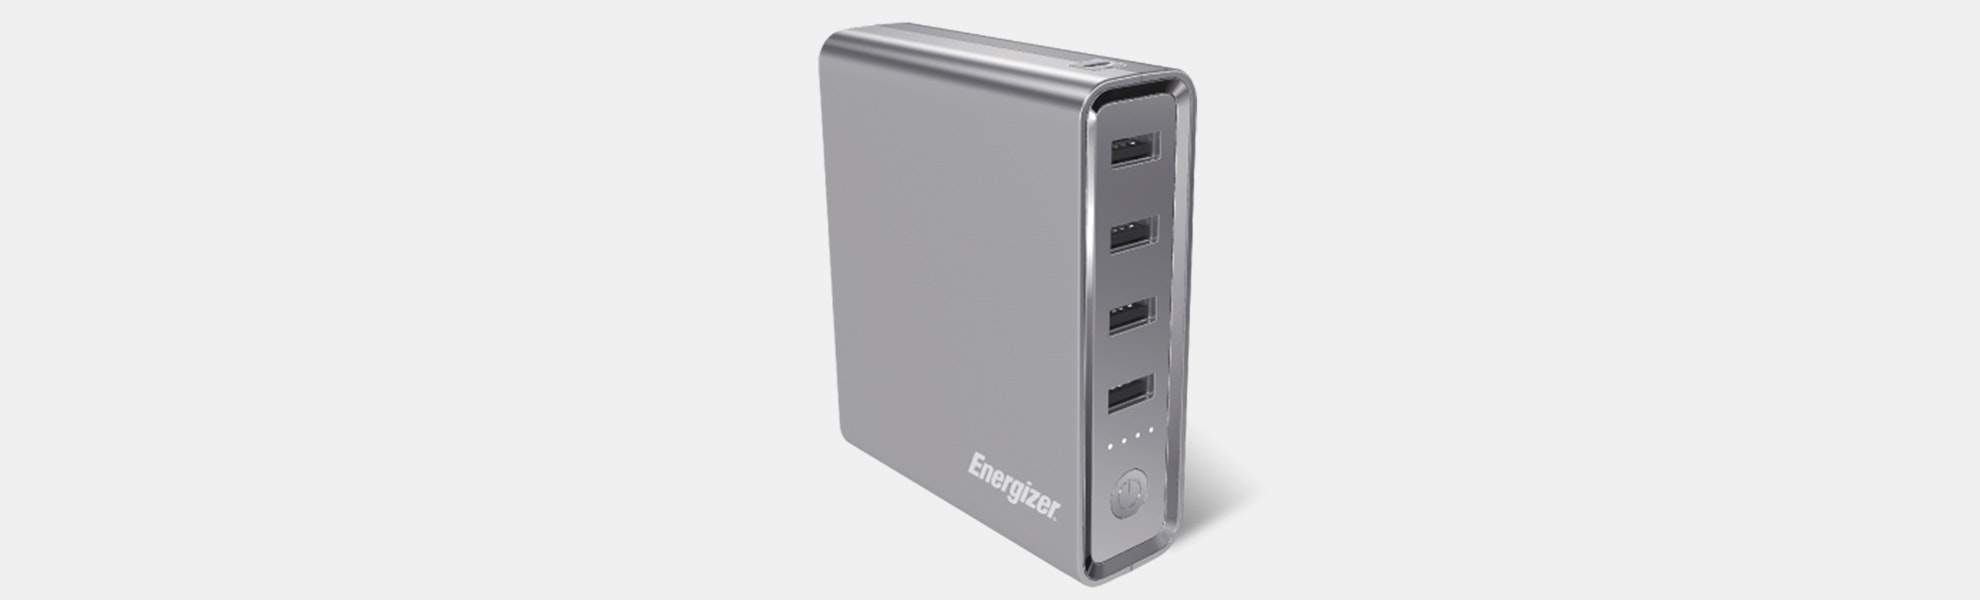 Energizer 20,000mAh USB-C 45W PD Powerbank